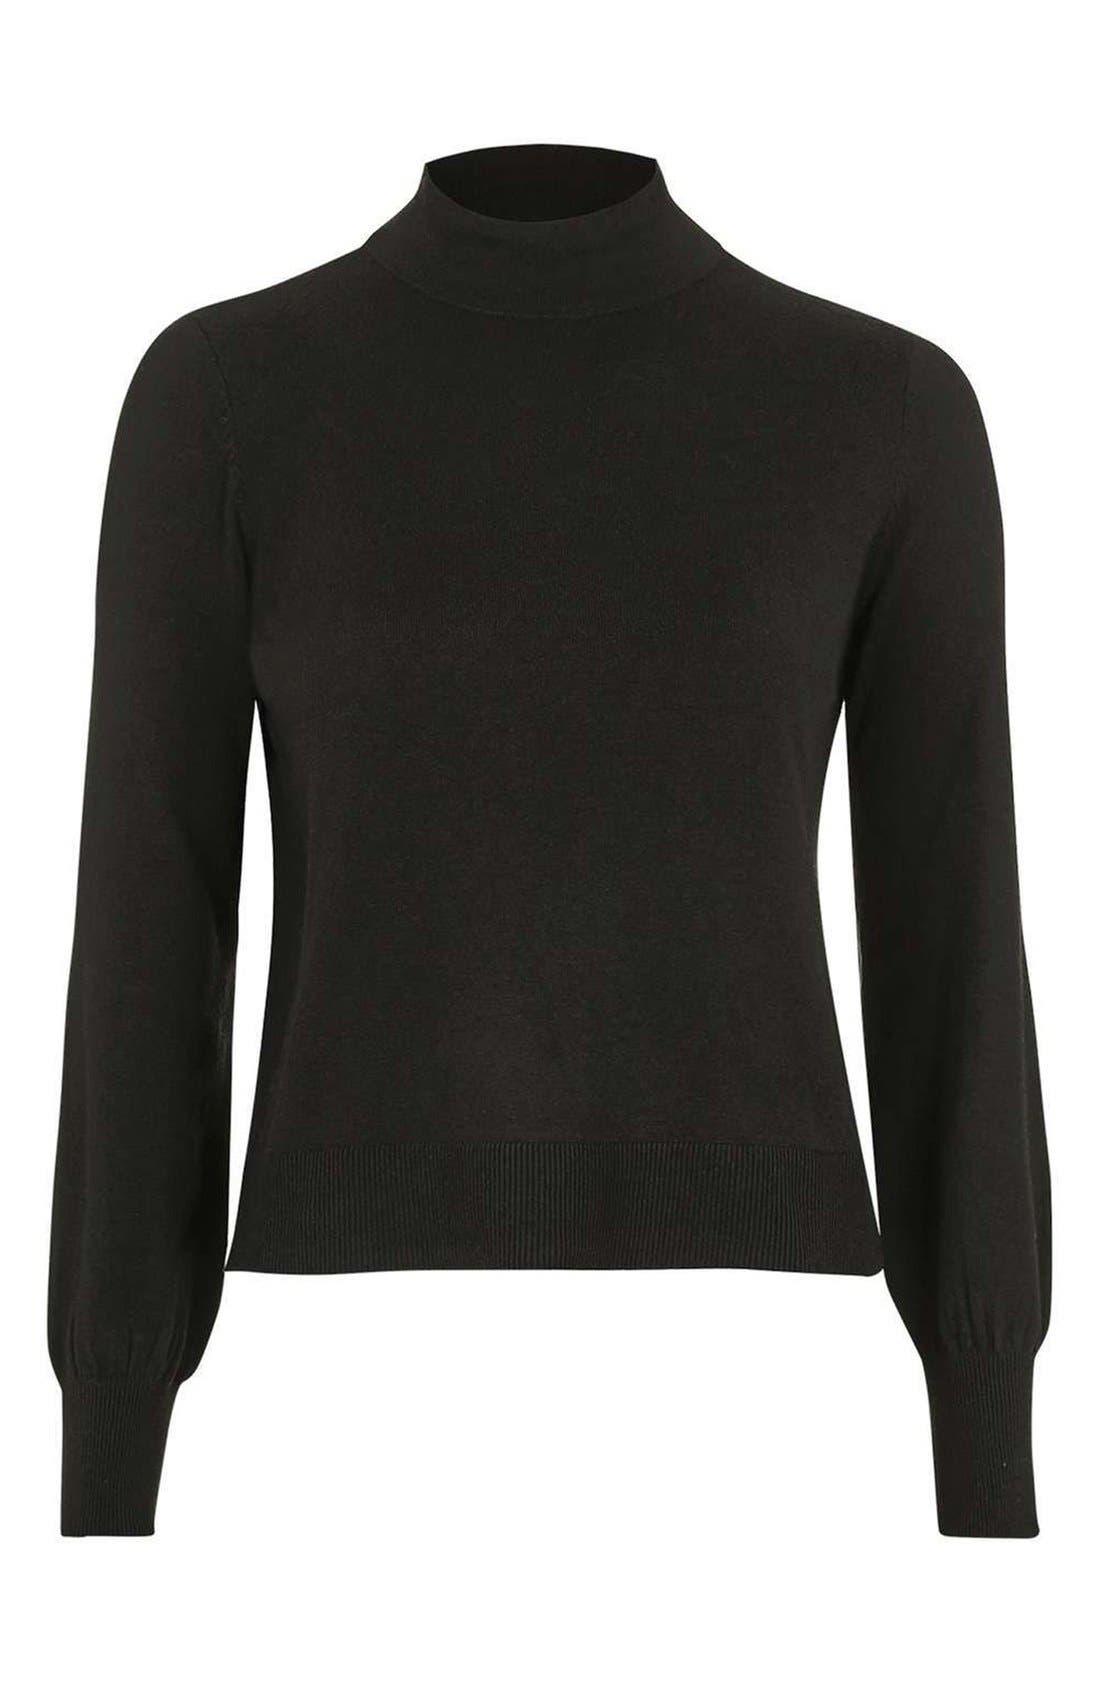 TOPSHOP, Blouson Sleeve Mock Neck Sweater, Alternate thumbnail 4, color, 001